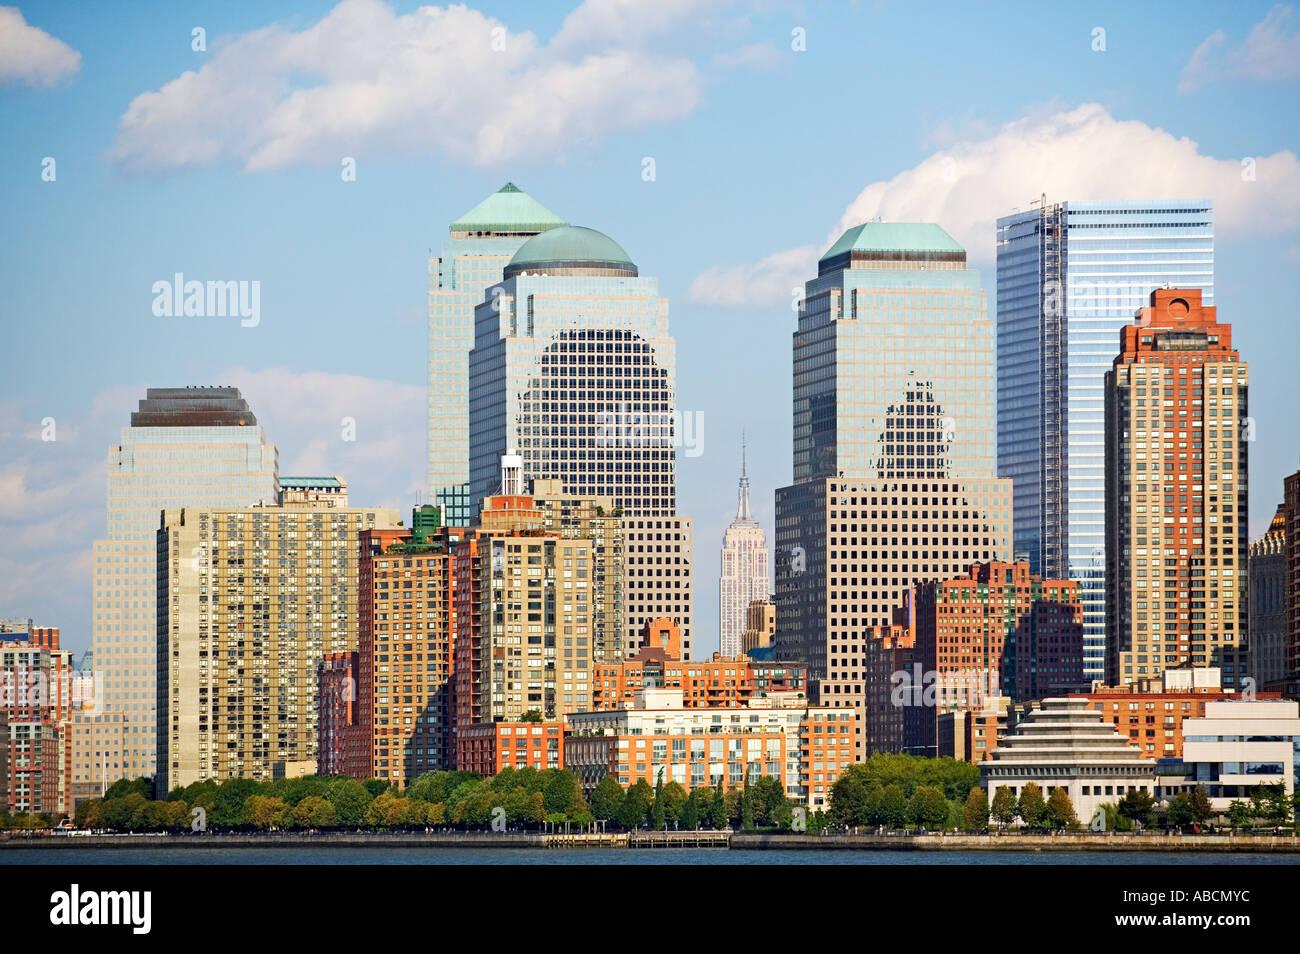 New york sky scrapers - Stock Image